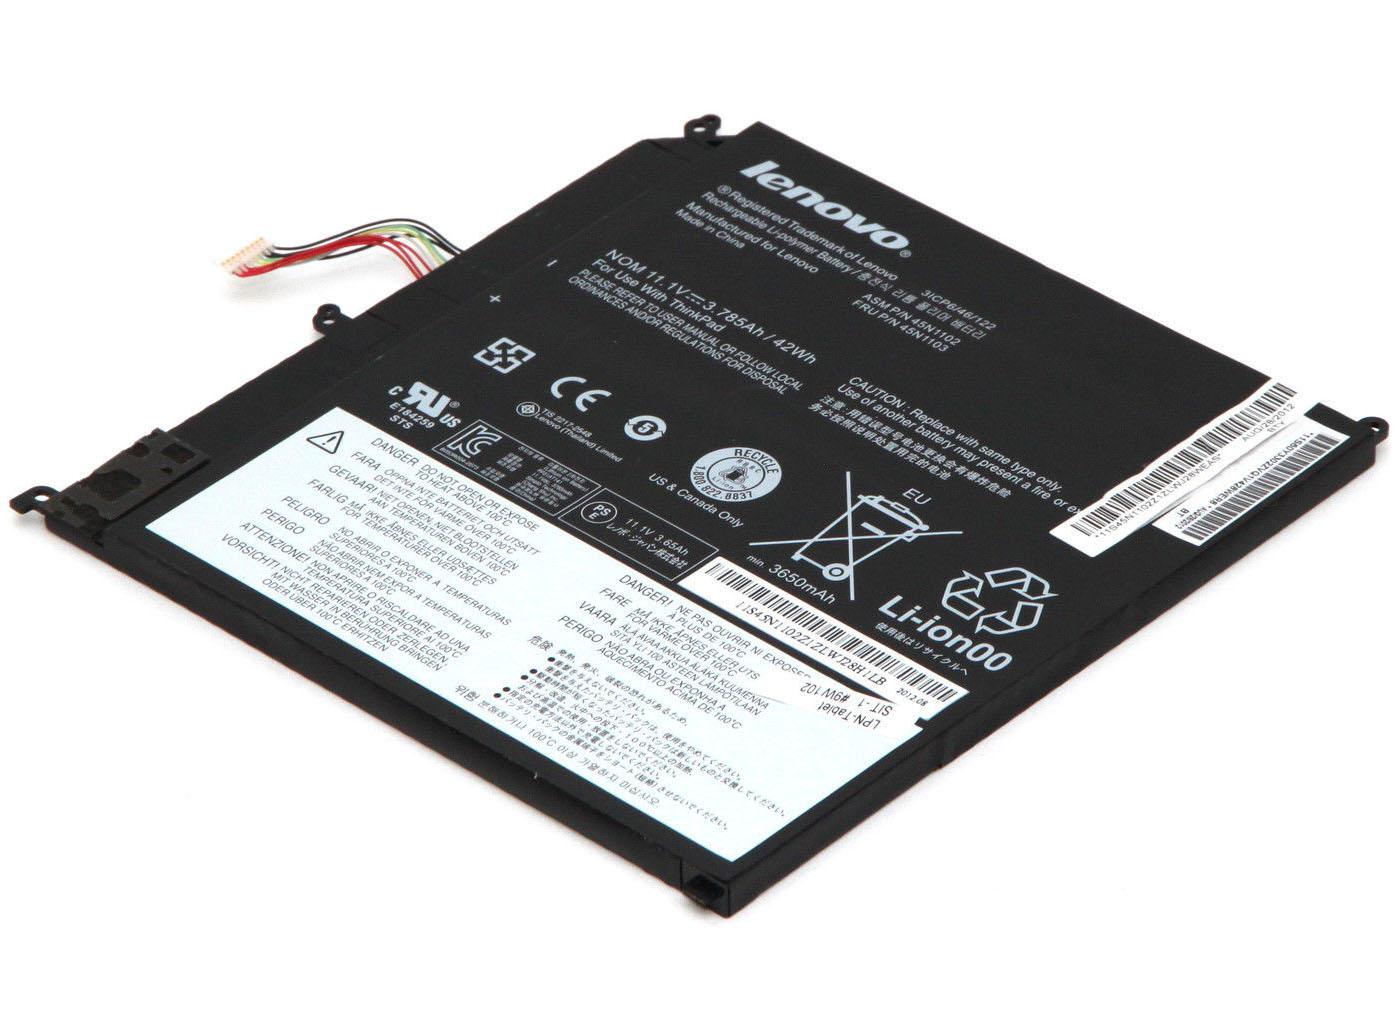 Original 45N1102-45N1103 Lenovo ThinkPad X1 Helix Battery